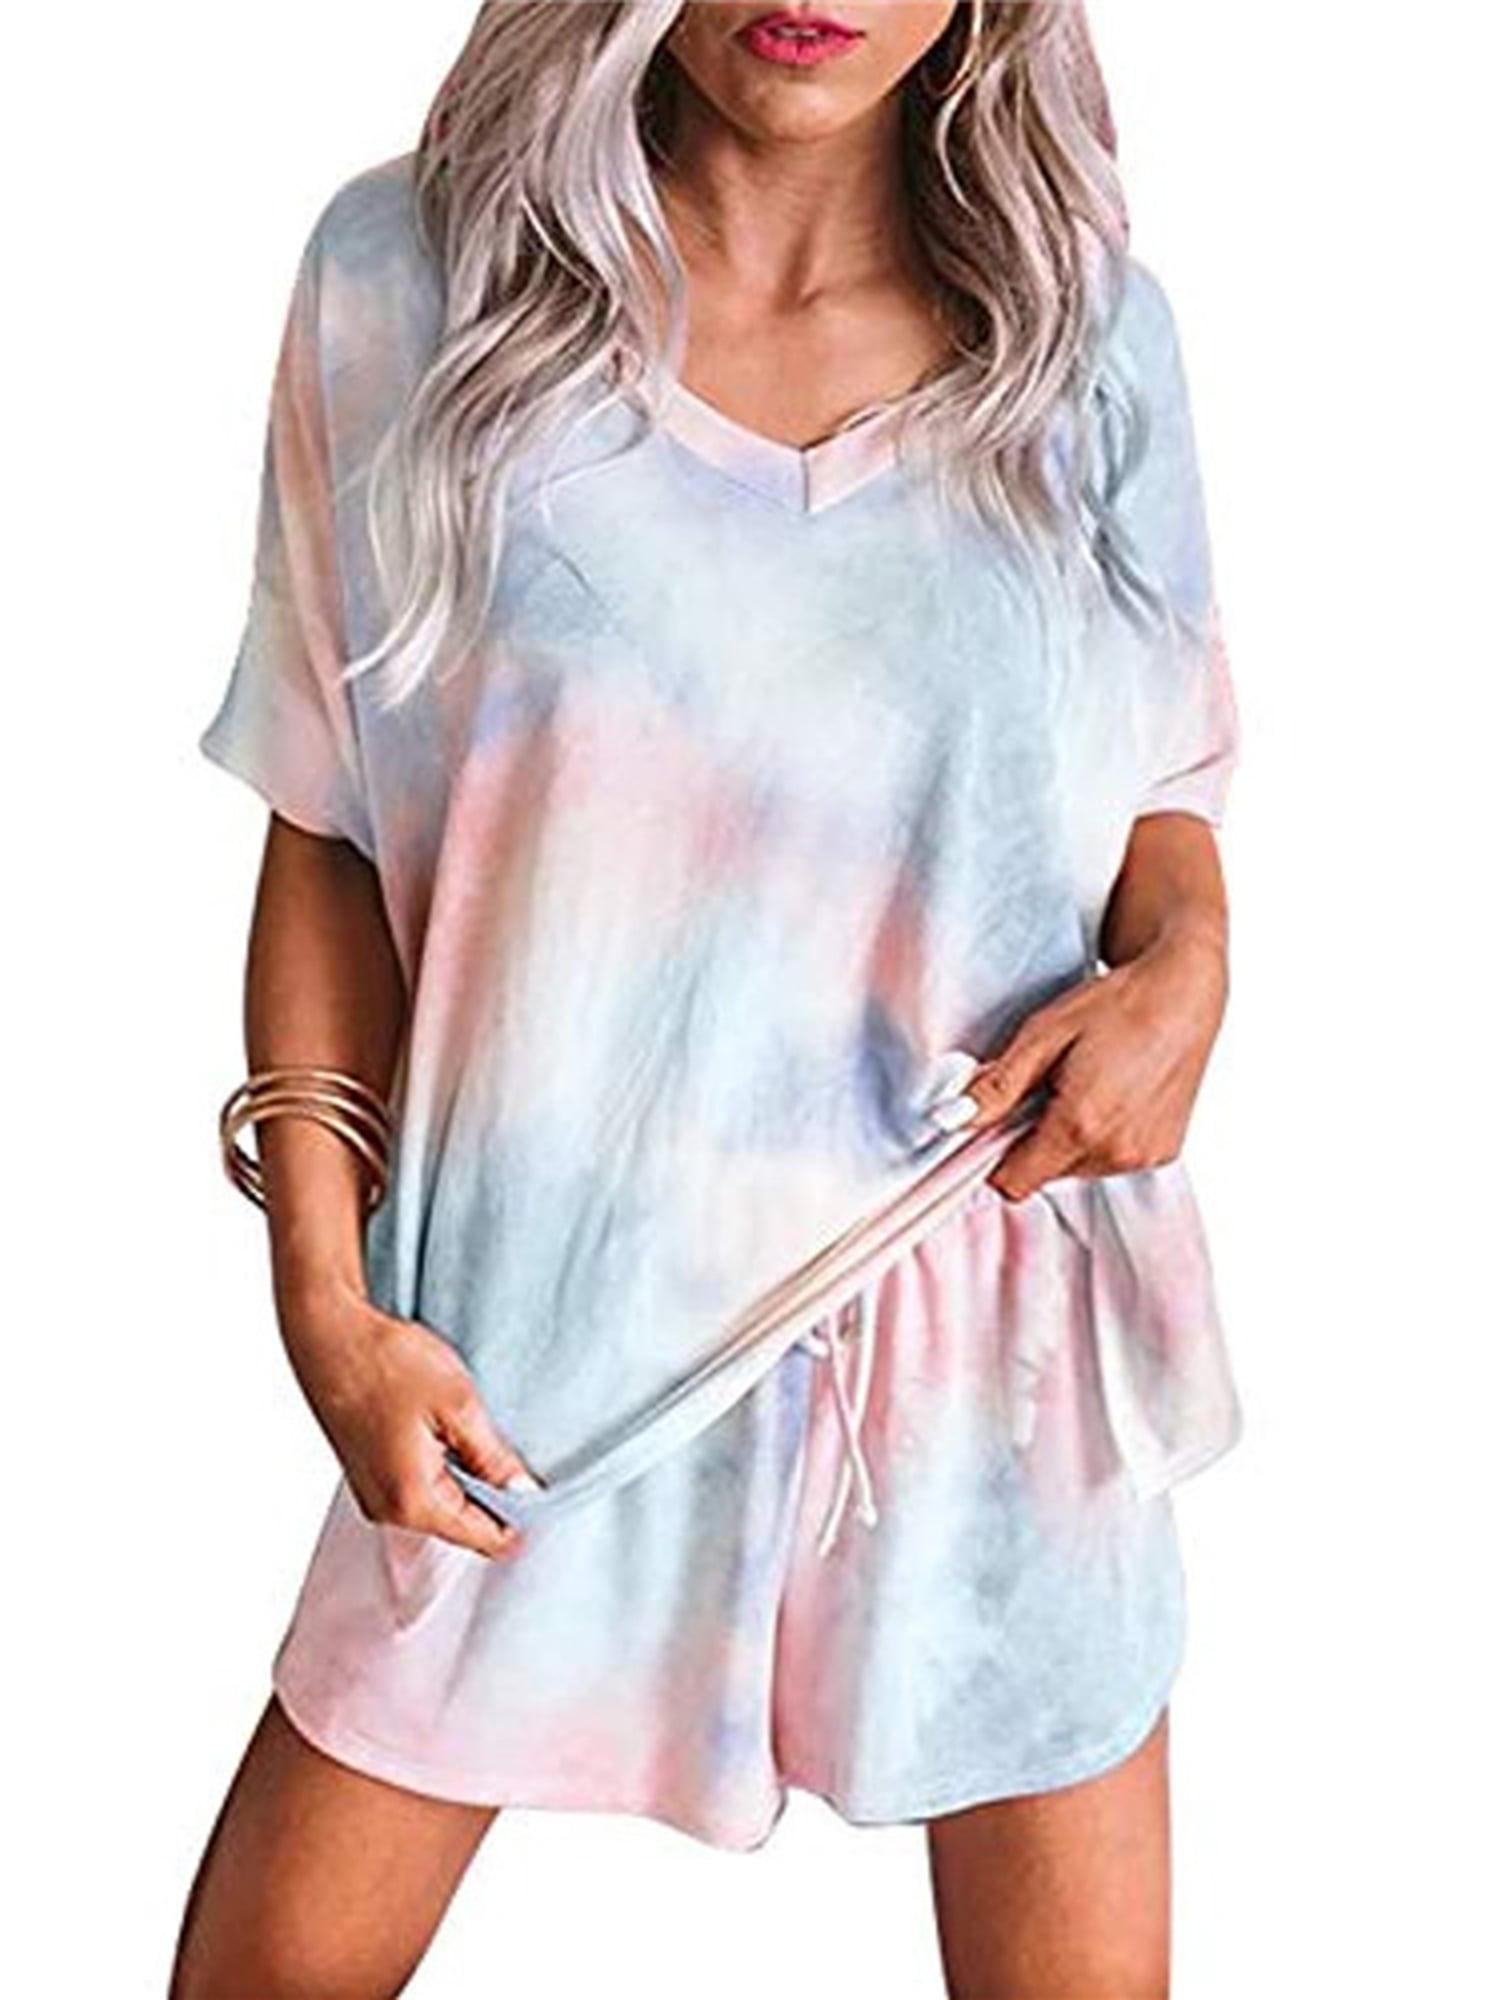 Details about  /Men Soft Short Sleeve Nightshirt Pyjama Nightdress Sleepwear Homewear Loungewear